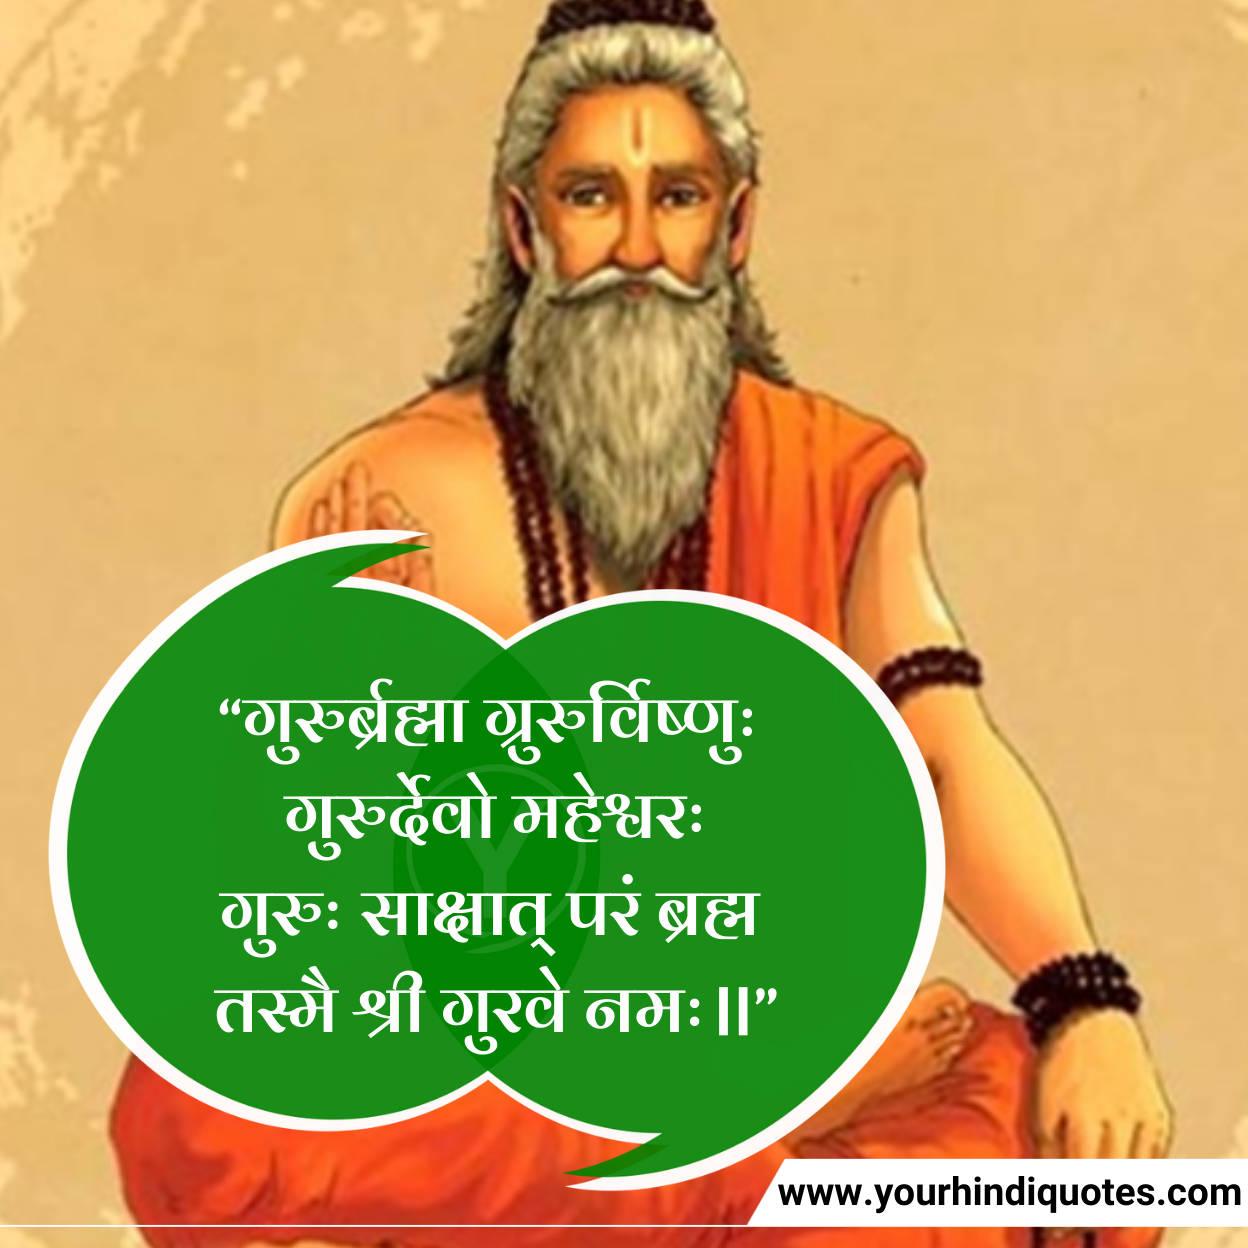 Guru Mantra Images